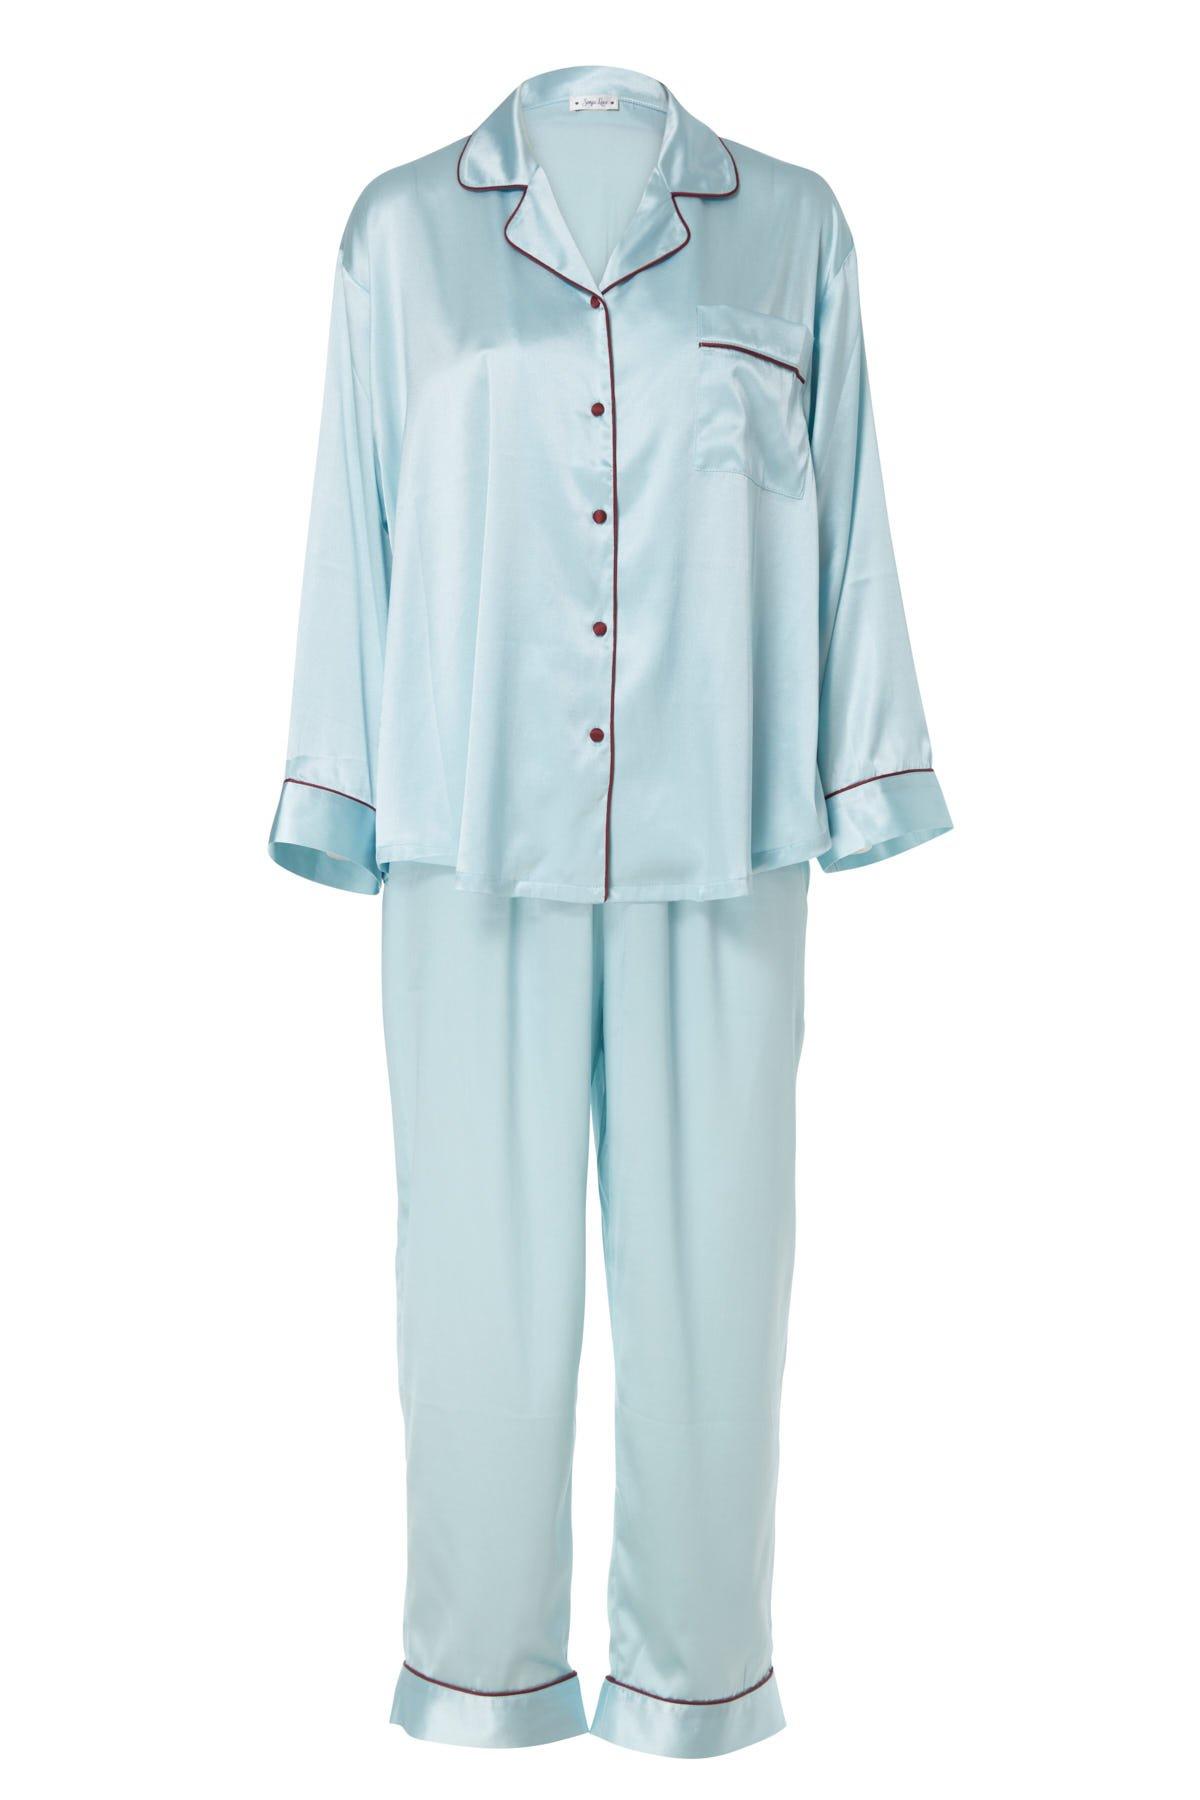 Sexy Pink Luxury Fur Bathrobe Sleepwear Night Robe Kimono